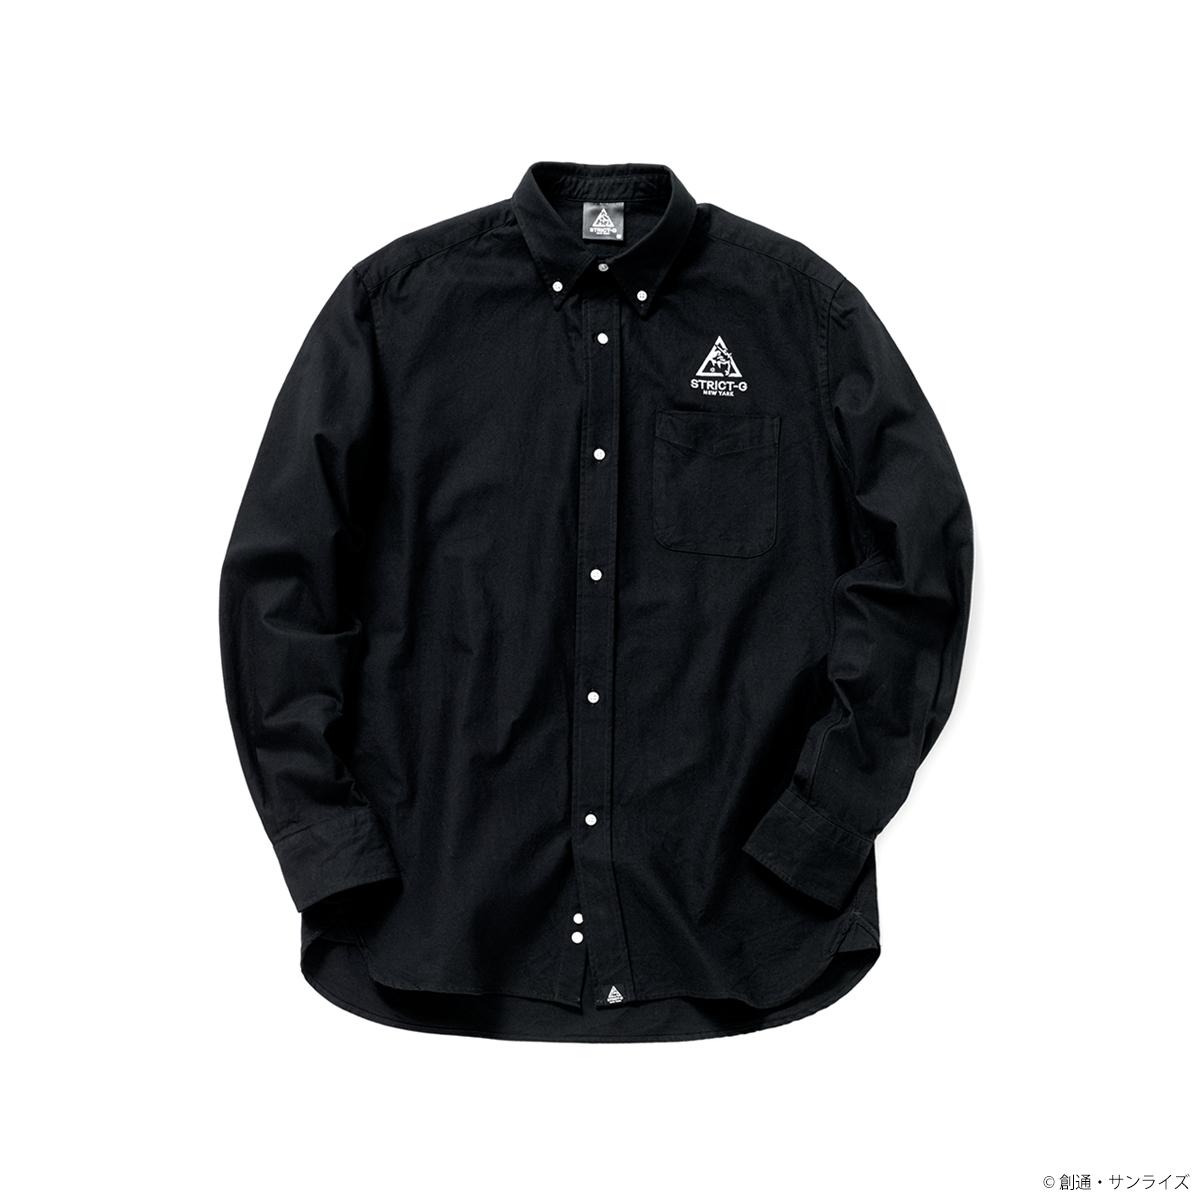 STRICT-G NEW YARK BDシャツ NYロゴ柄